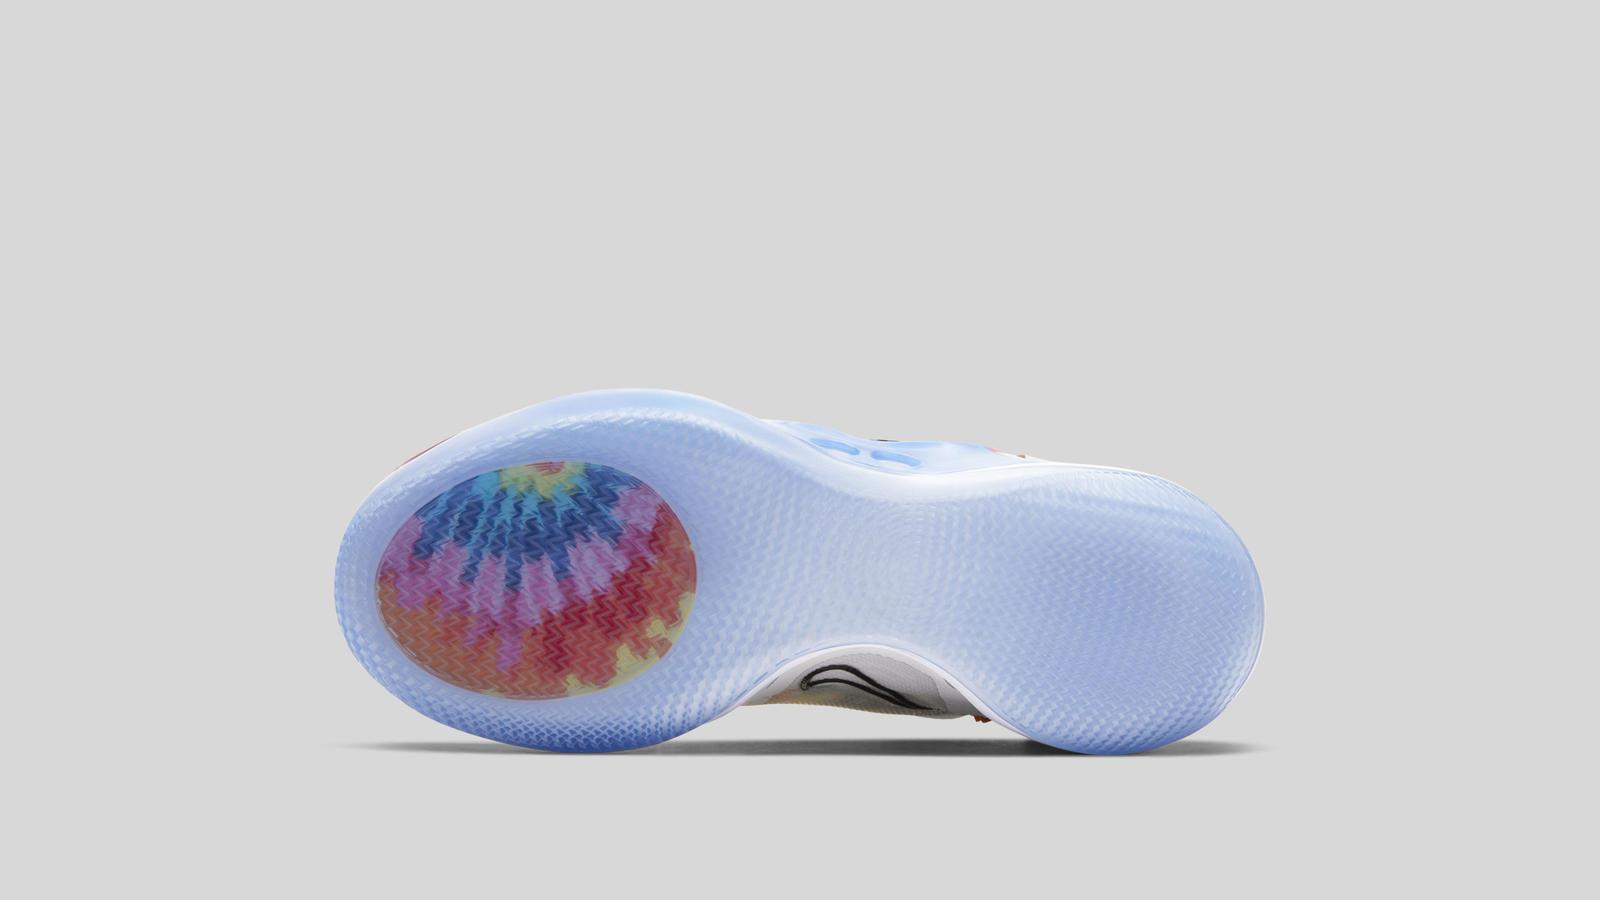 Nike Adapt BB 2.0 Tie Dye 1